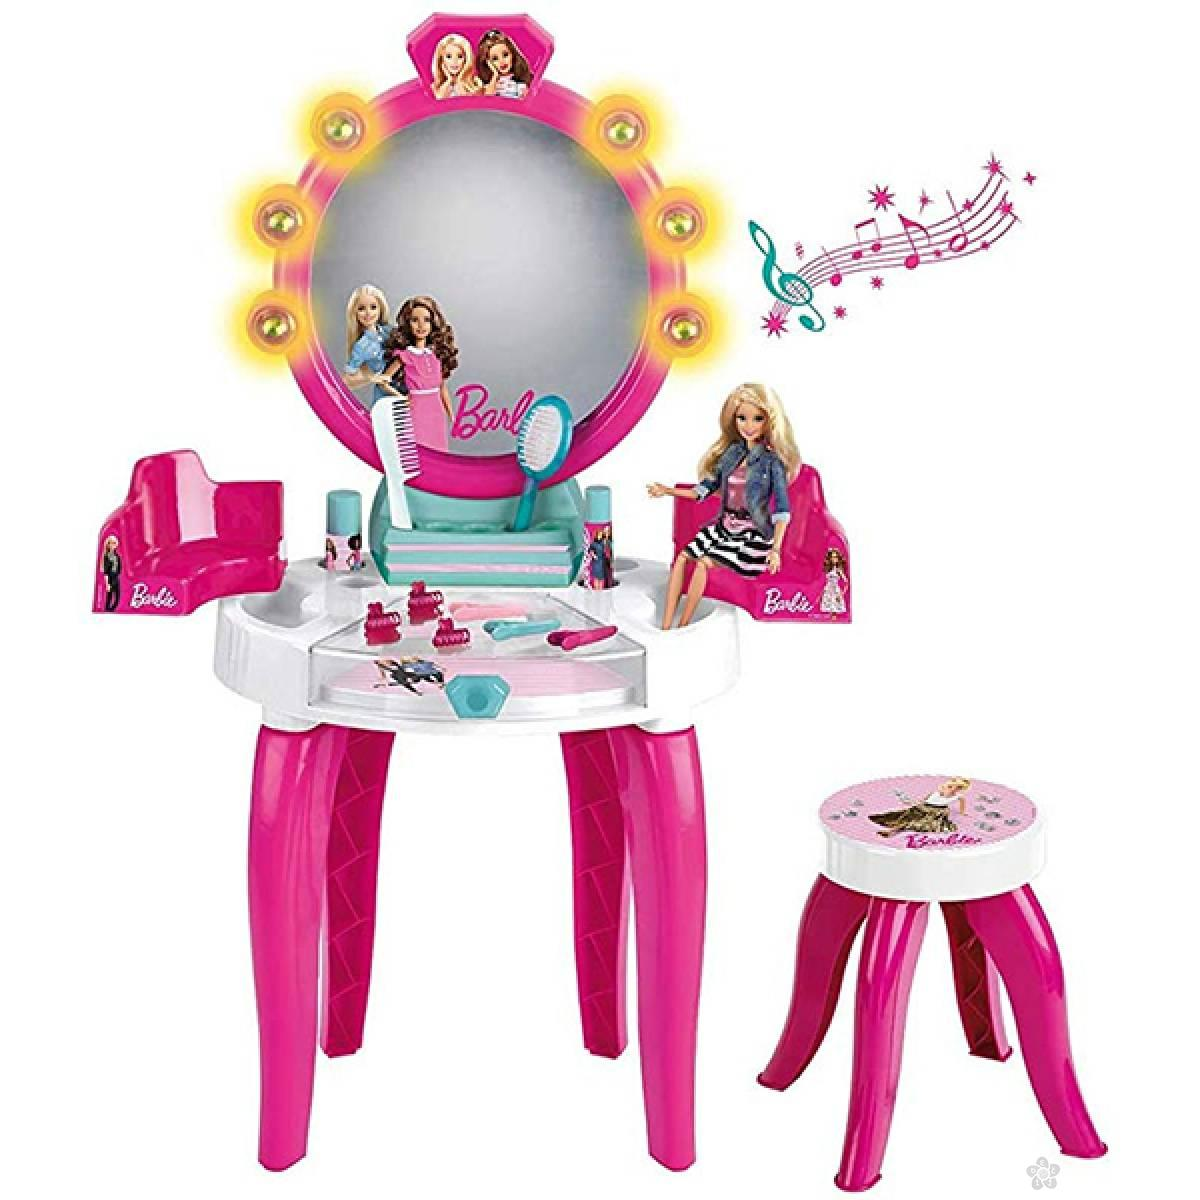 Barbie salon lepote sa dodacima Klein KL5328